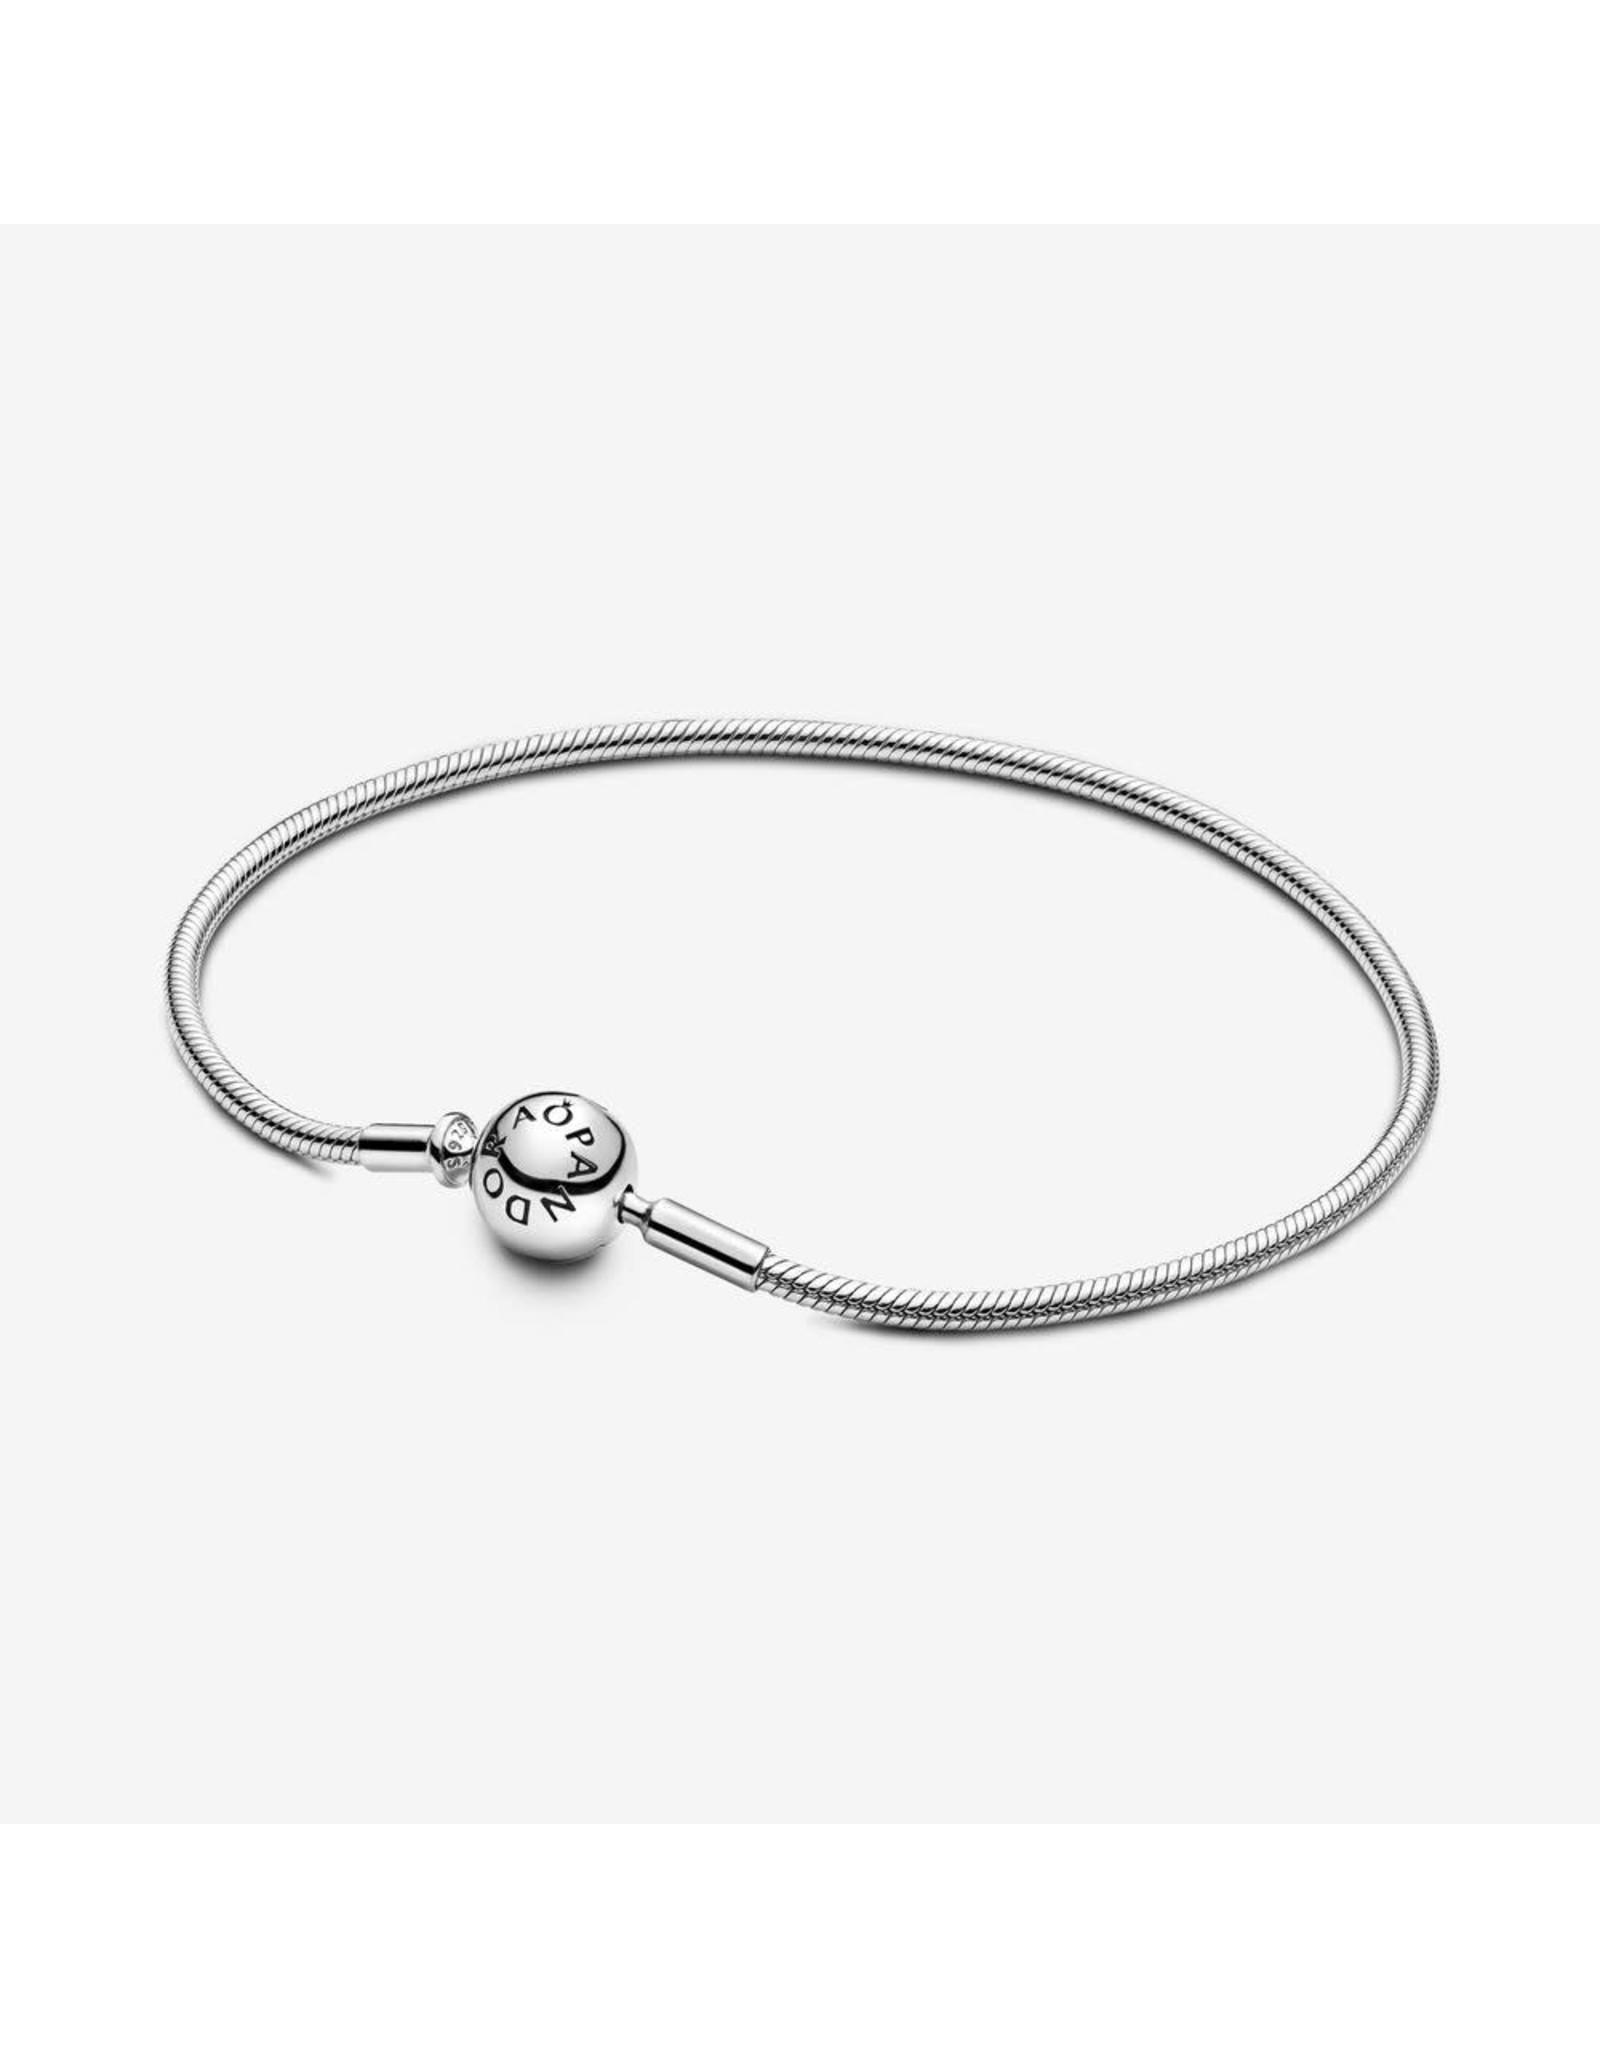 Pandora Pandora Me Bracelet, Snake Chain Sterling Silver 17 cm